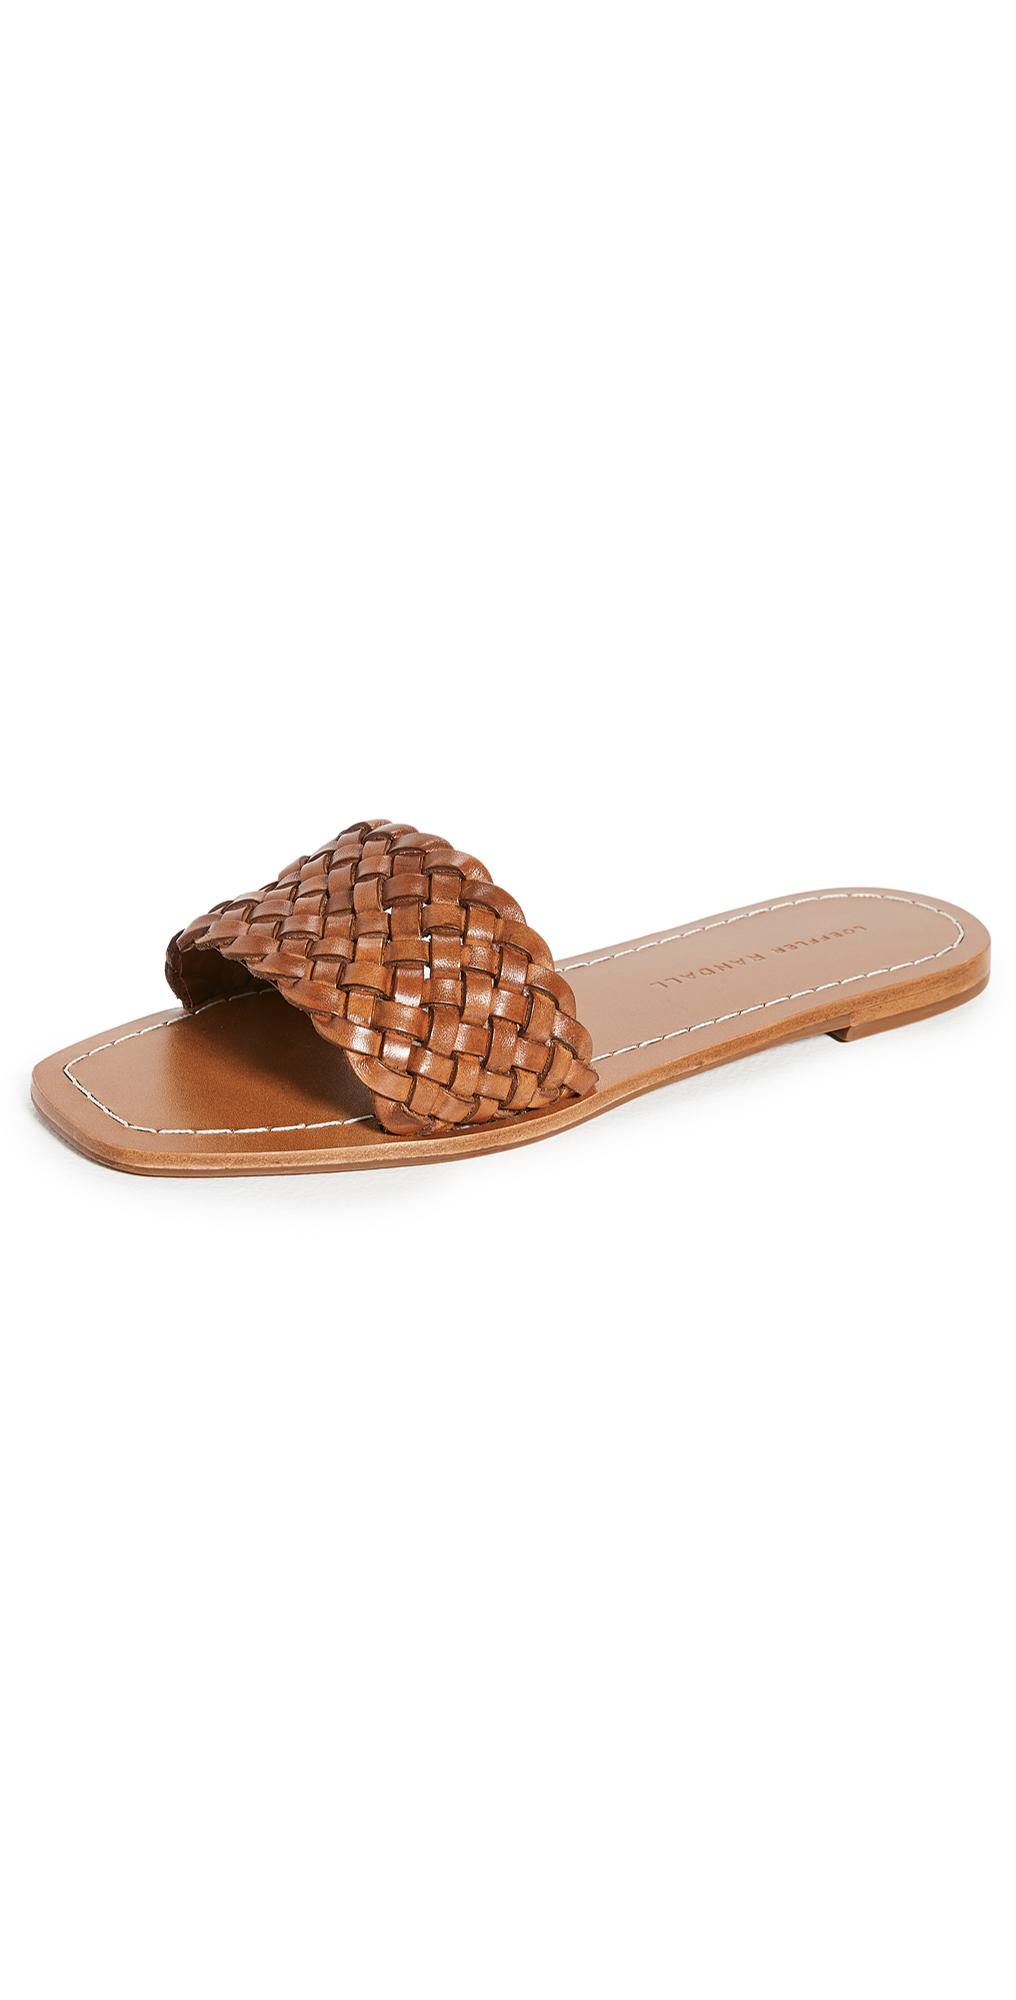 Loeffler Randall Joey Woven Square Toe Slide Sandals